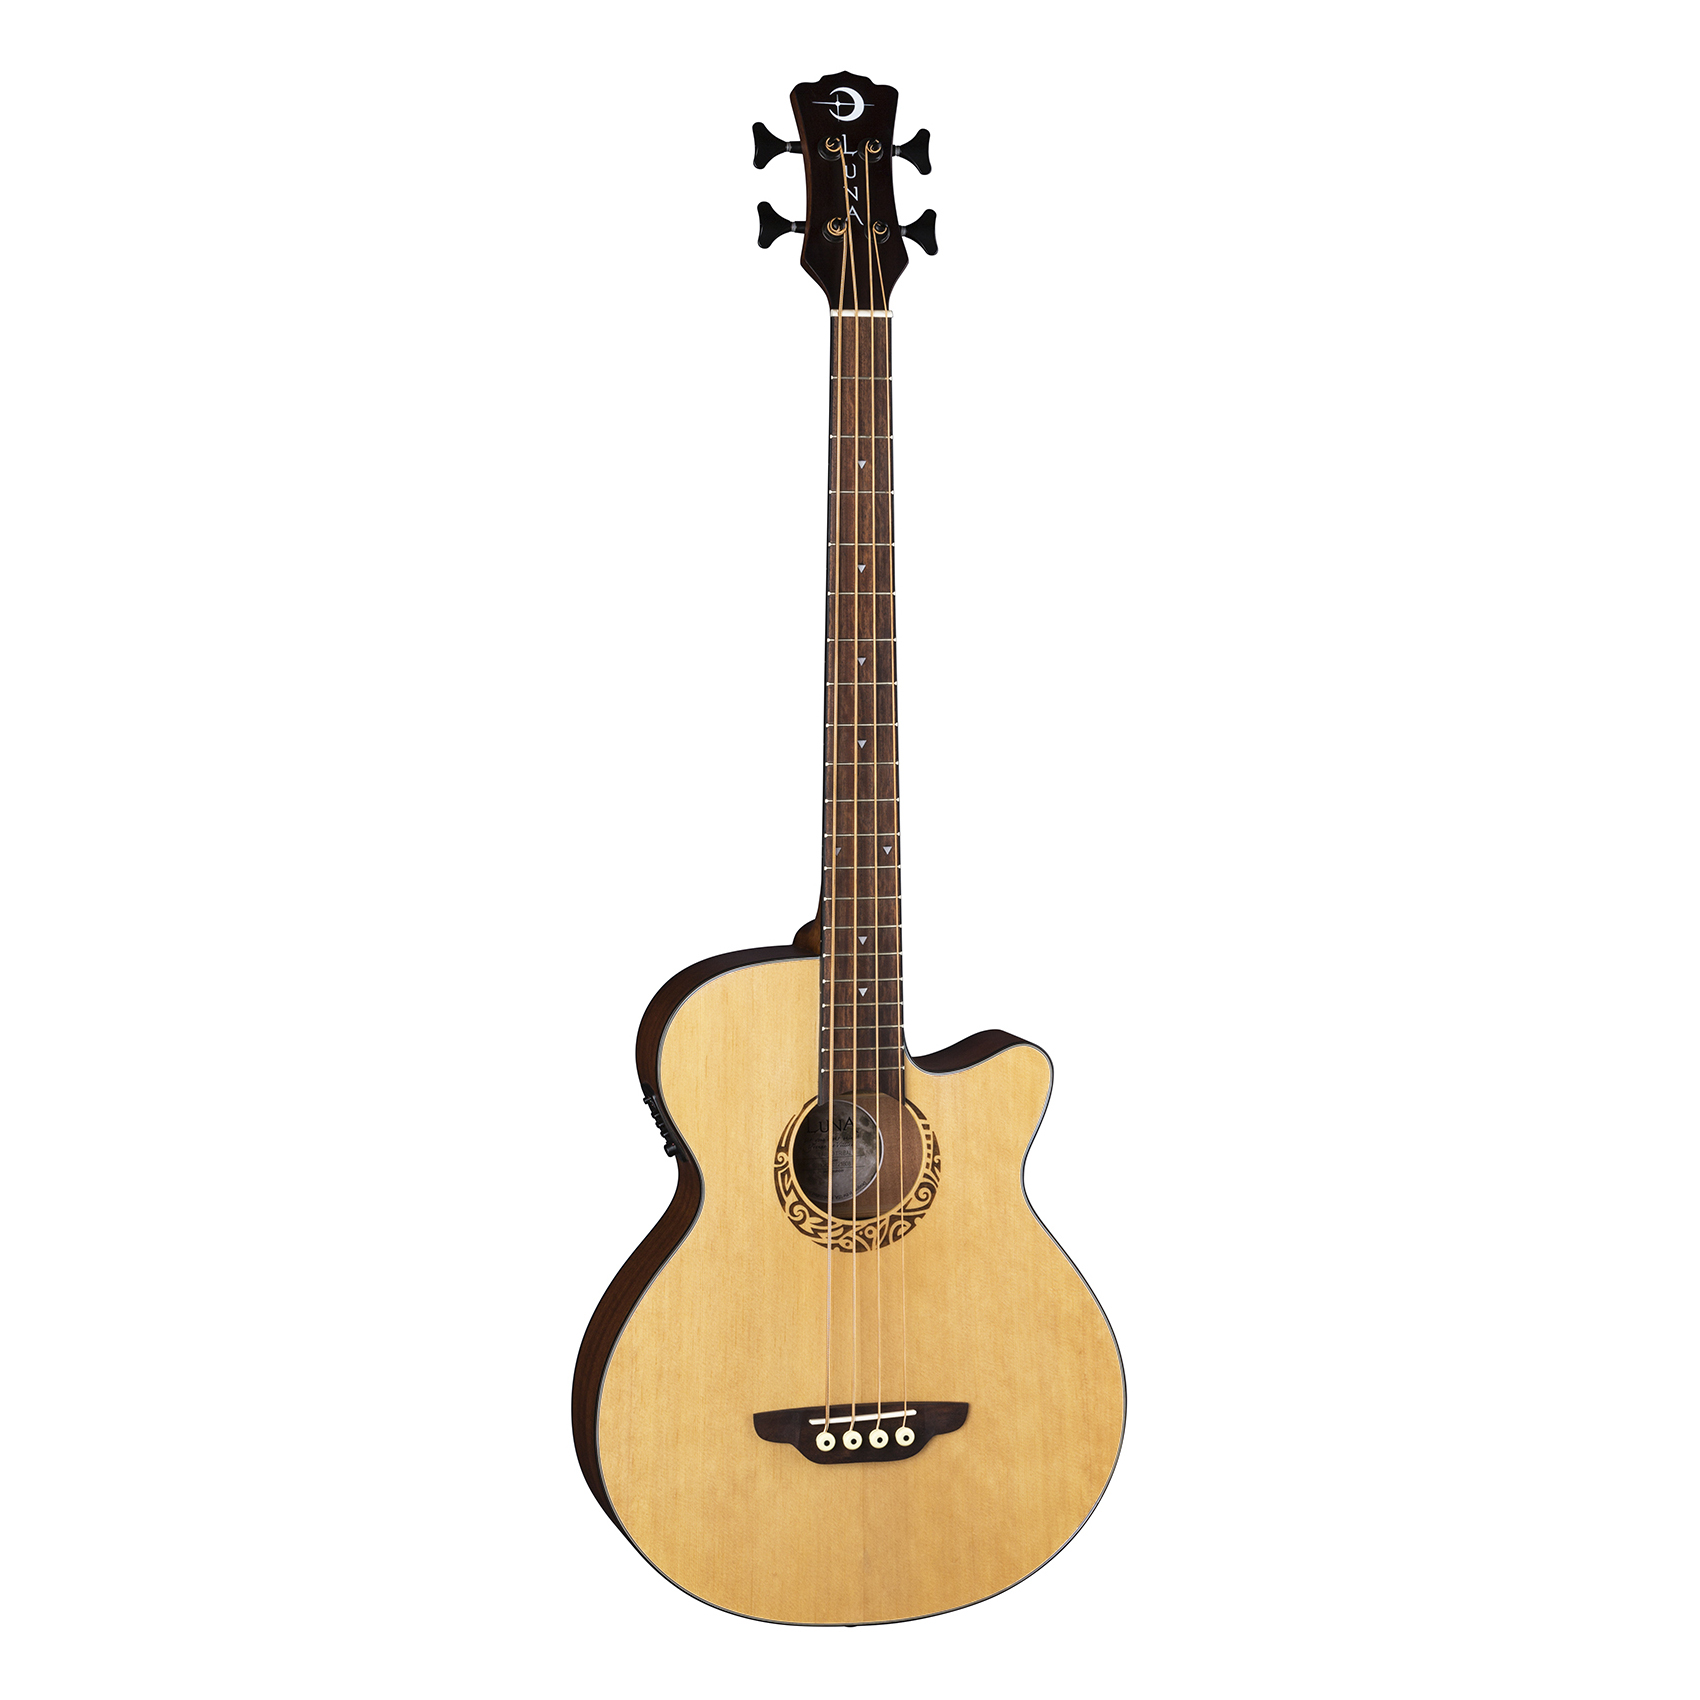 Luna Tribal Bass A/E Satin Natural - LAB 30 TRIBAL